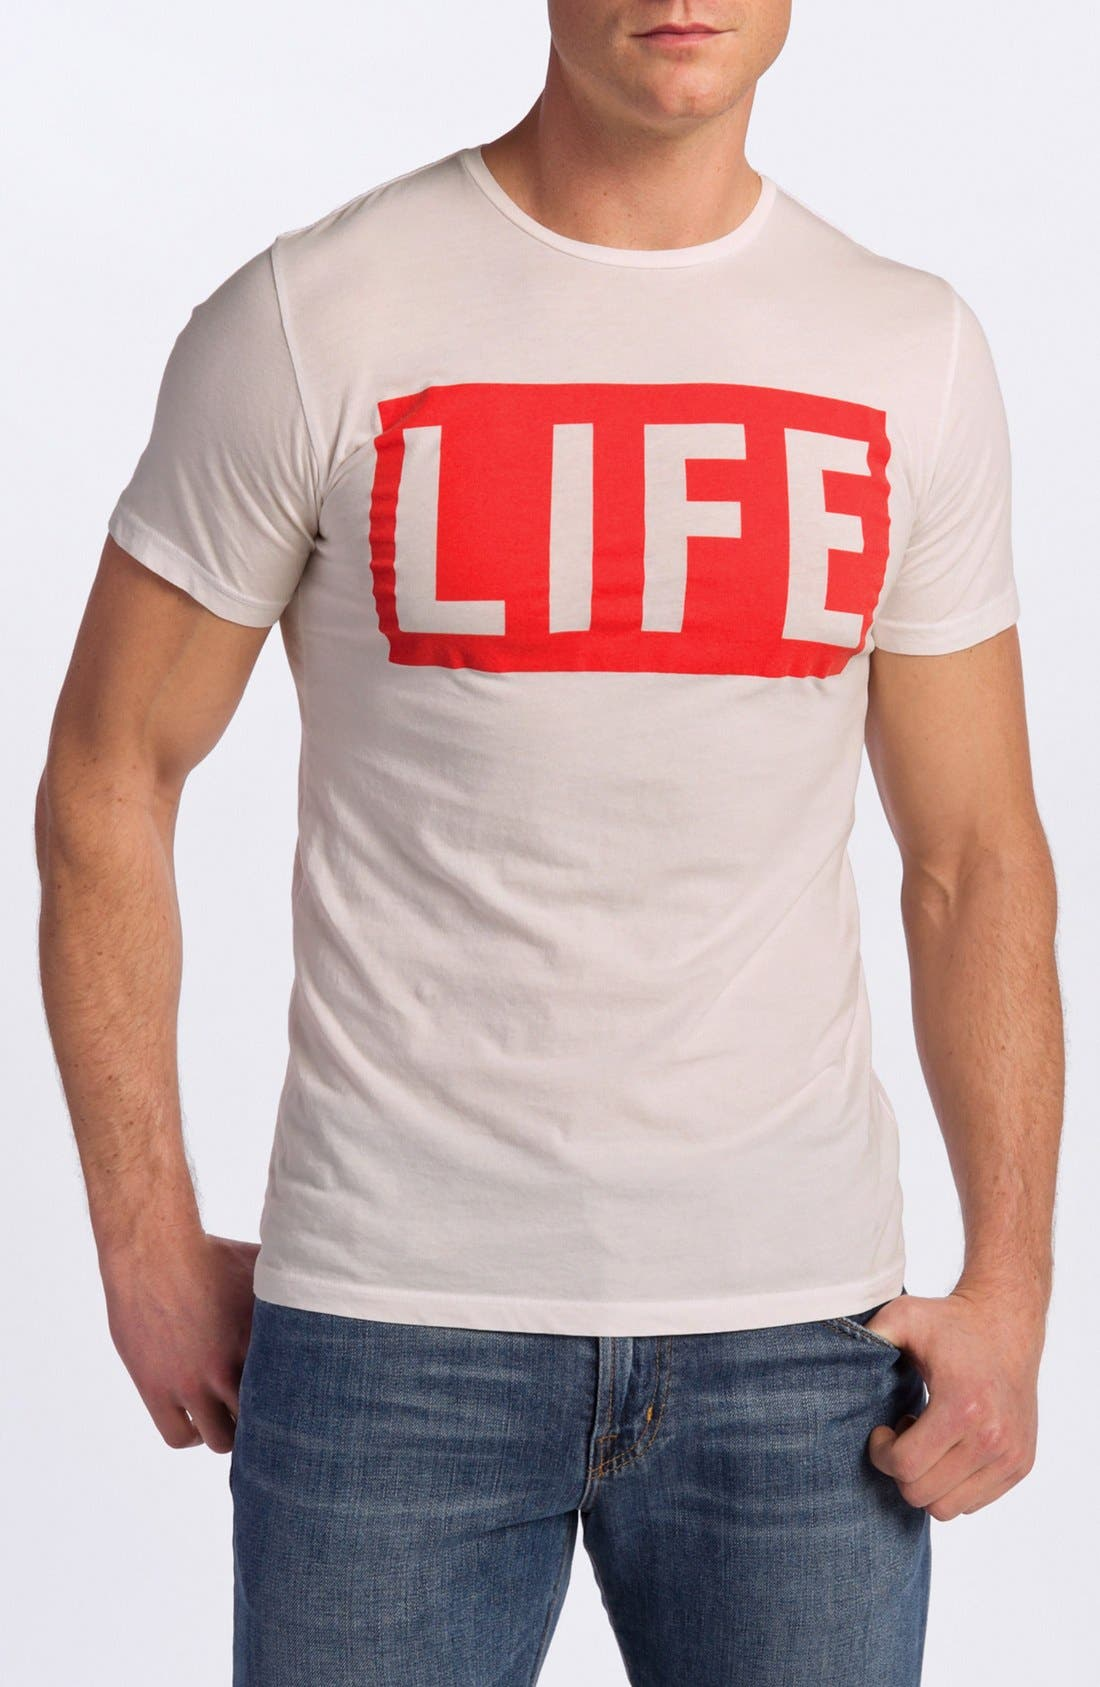 Alternate Image 1 Selected - Altru 'LIFE®' Graphic Crewneck T-Shirt